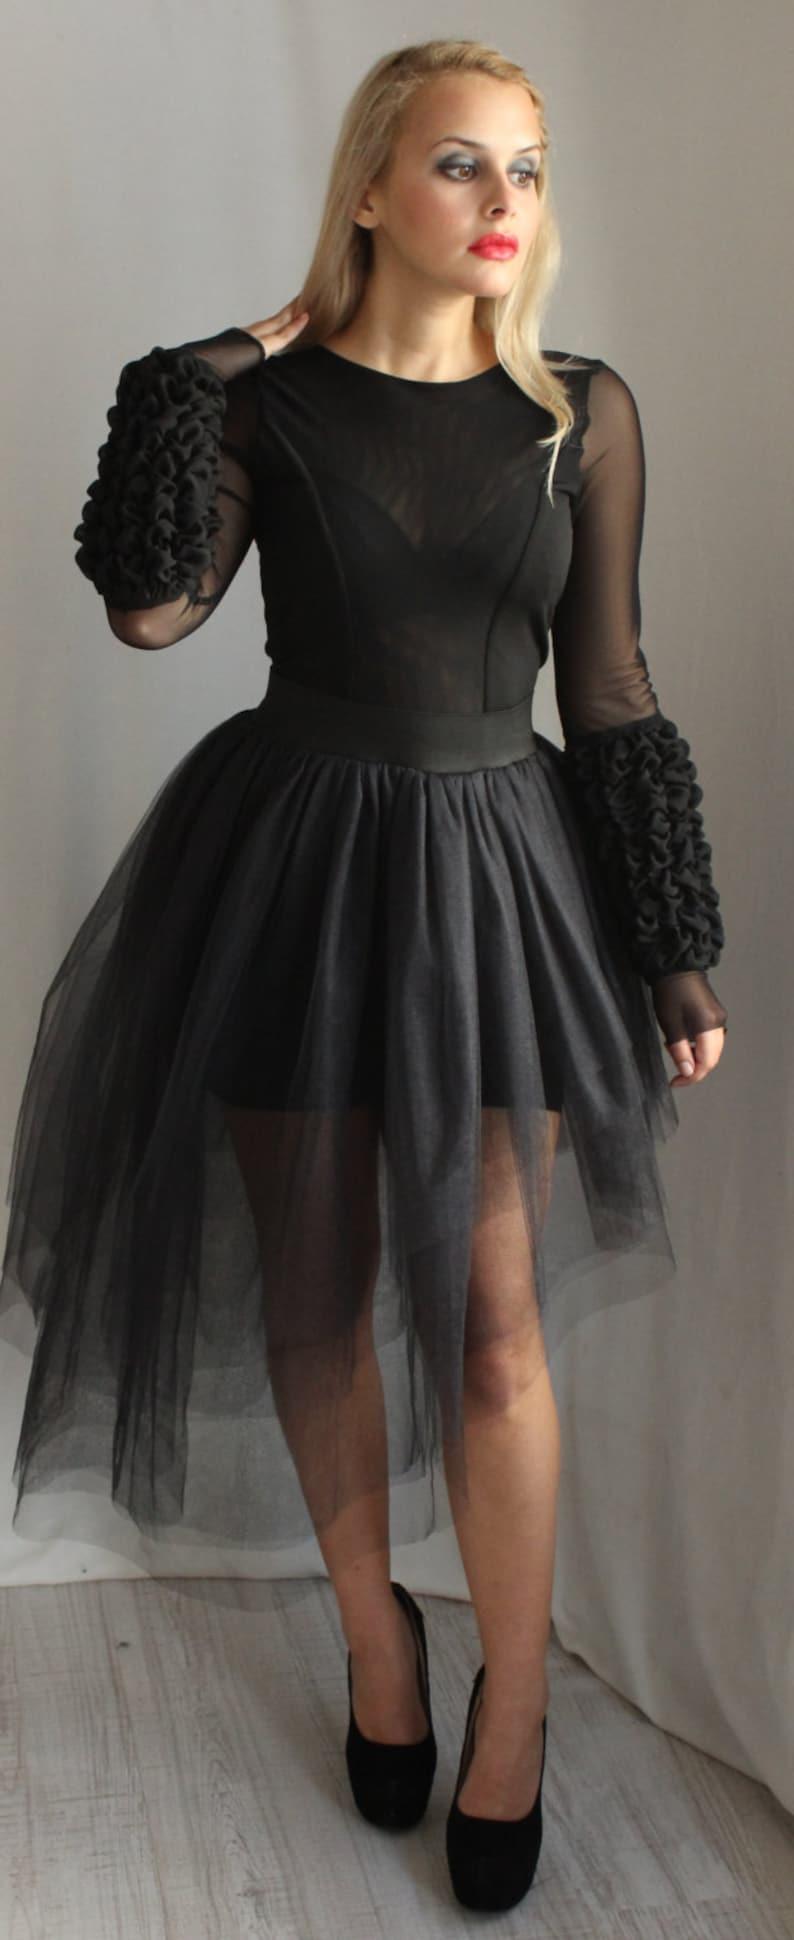 Formal Dress For Women Plus Size Wedding Dress Black Dress | Etsy